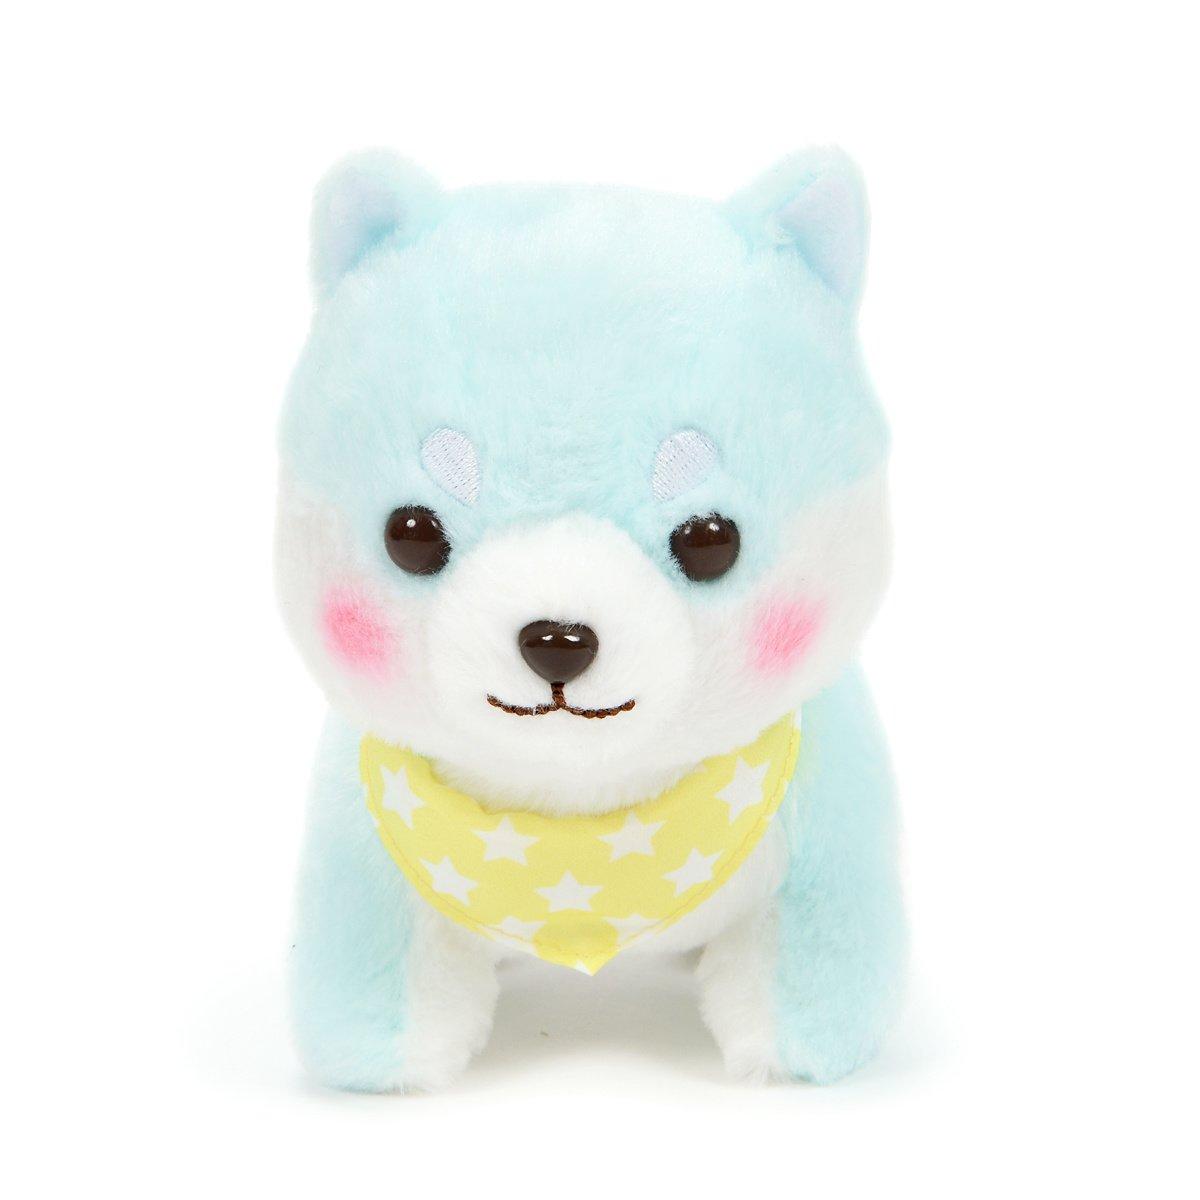 Amuse Dog Plushie, Mameshiba San Kyodai Funwari Yume no Kuni Taiga Pastel Green 5 Inches Standard Size